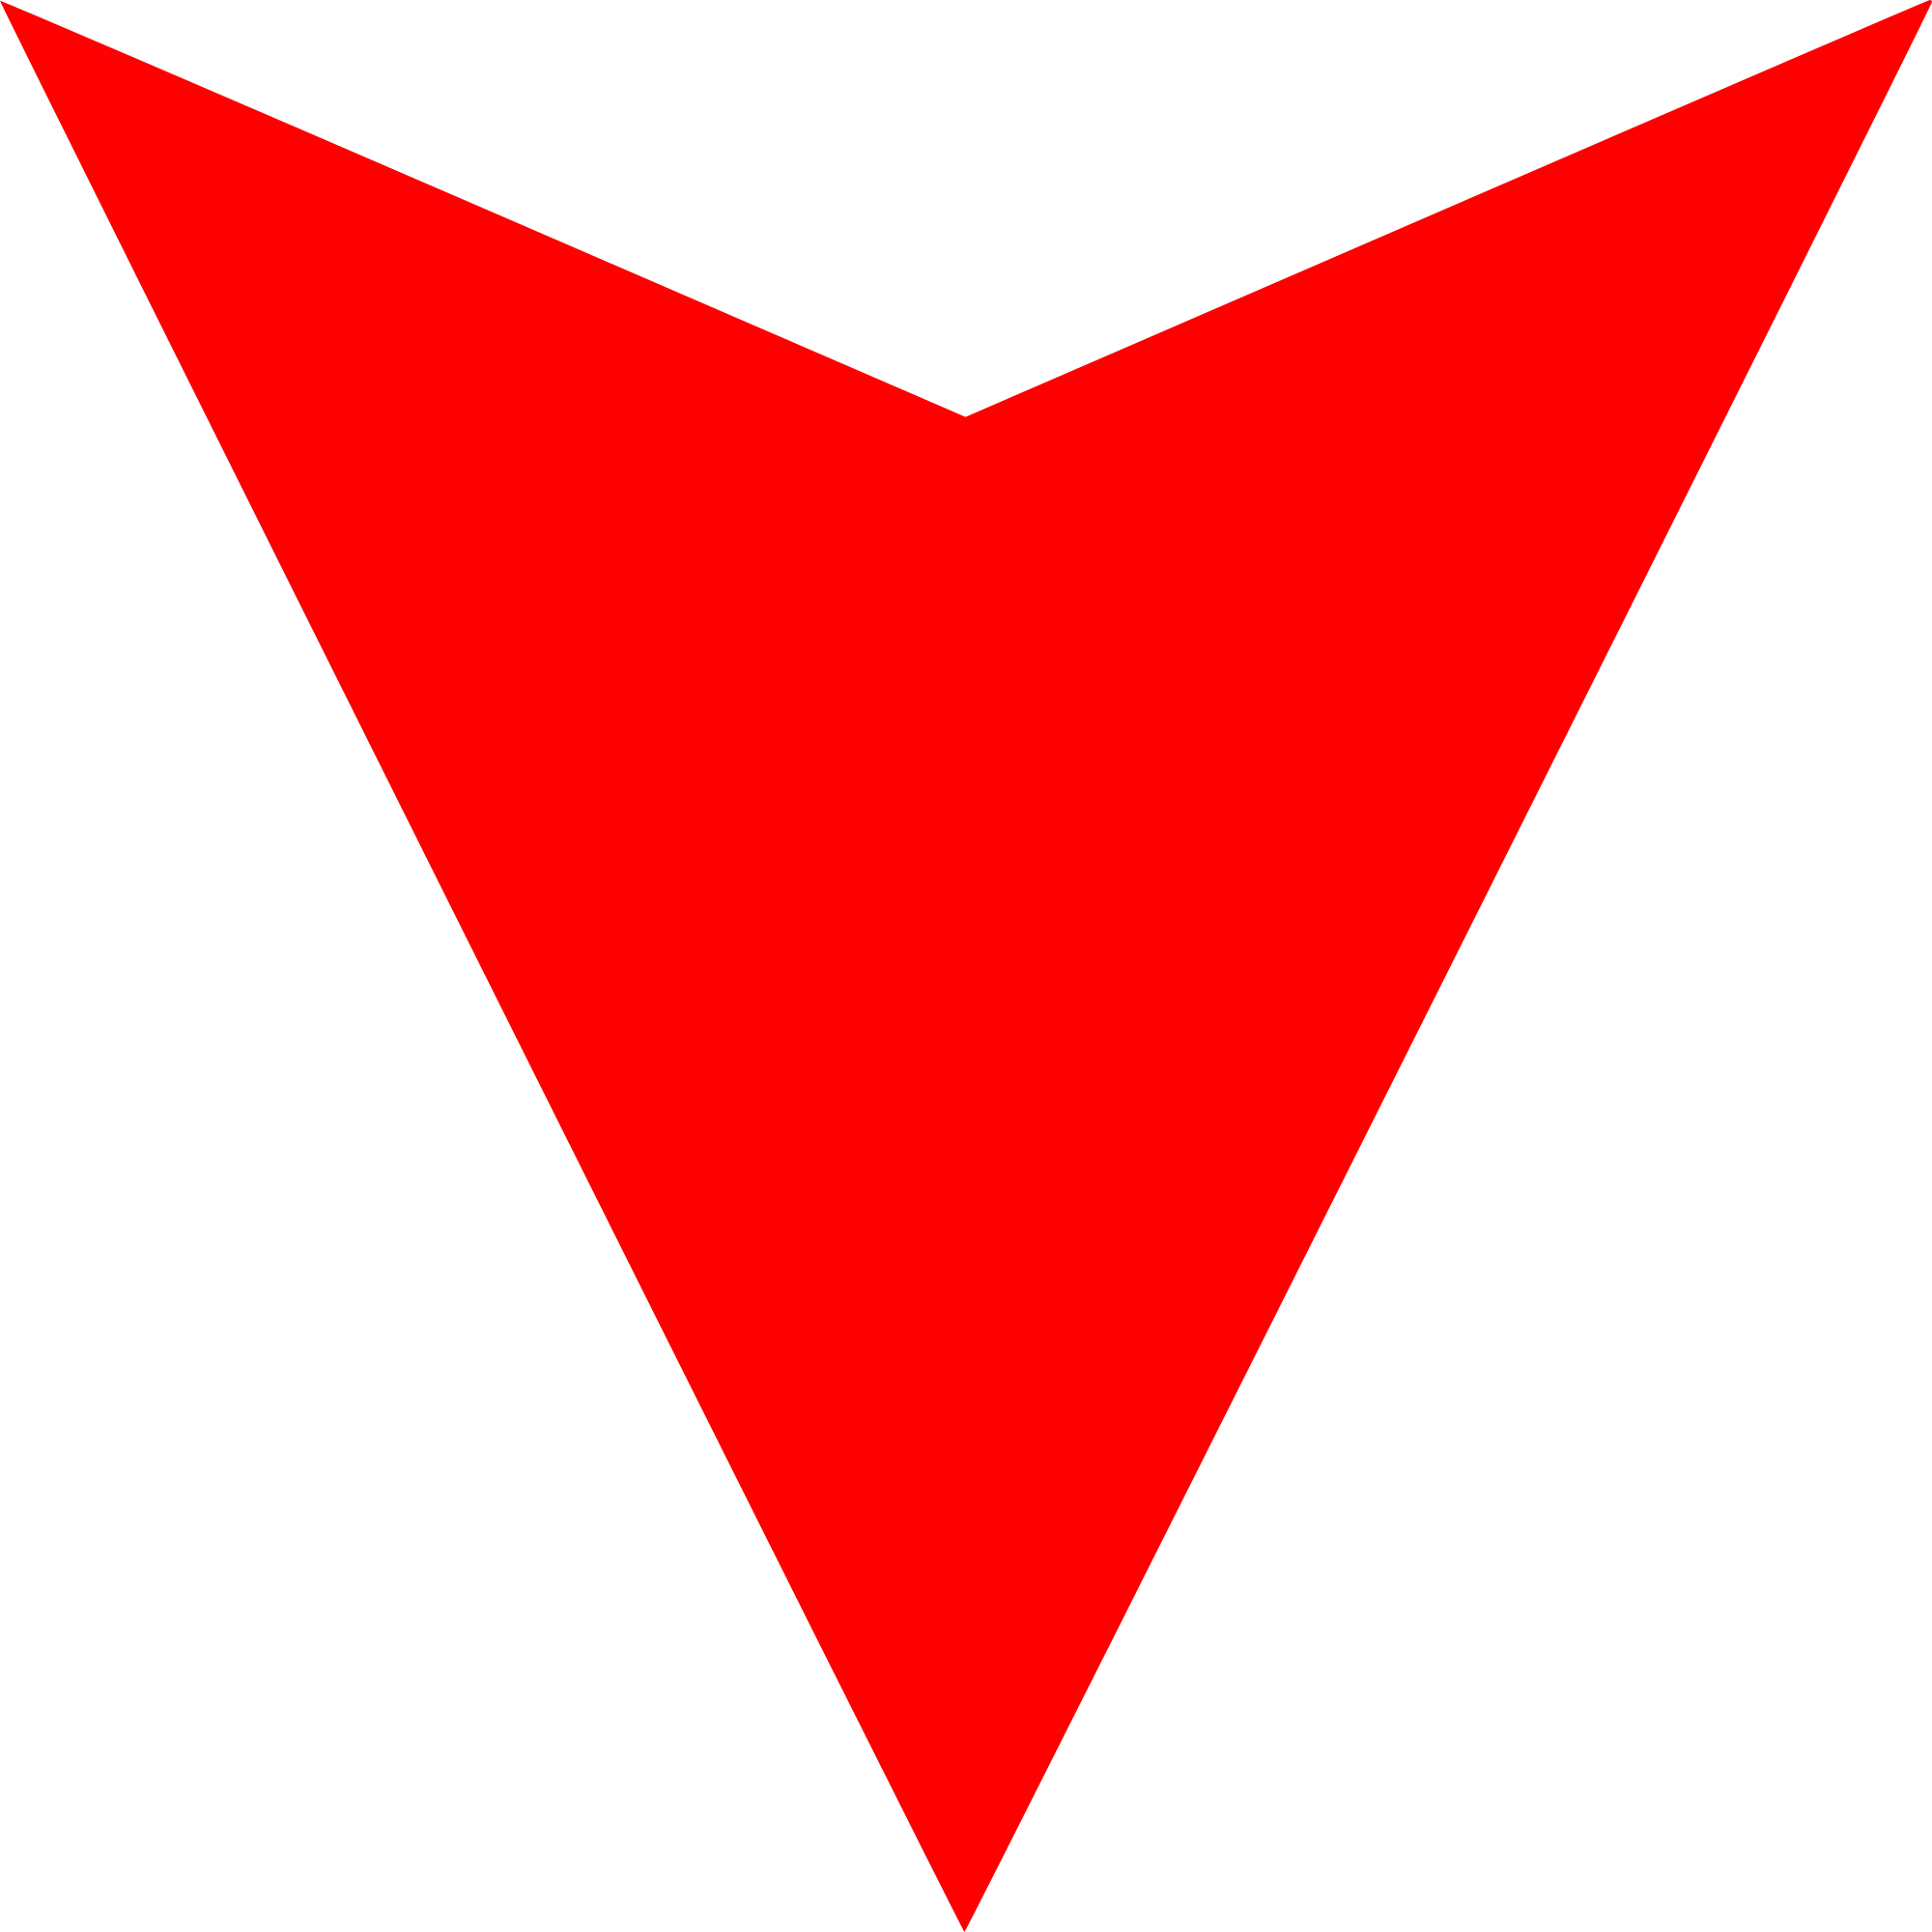 Arrowhead clipart arrow down. File red svg wikimedia